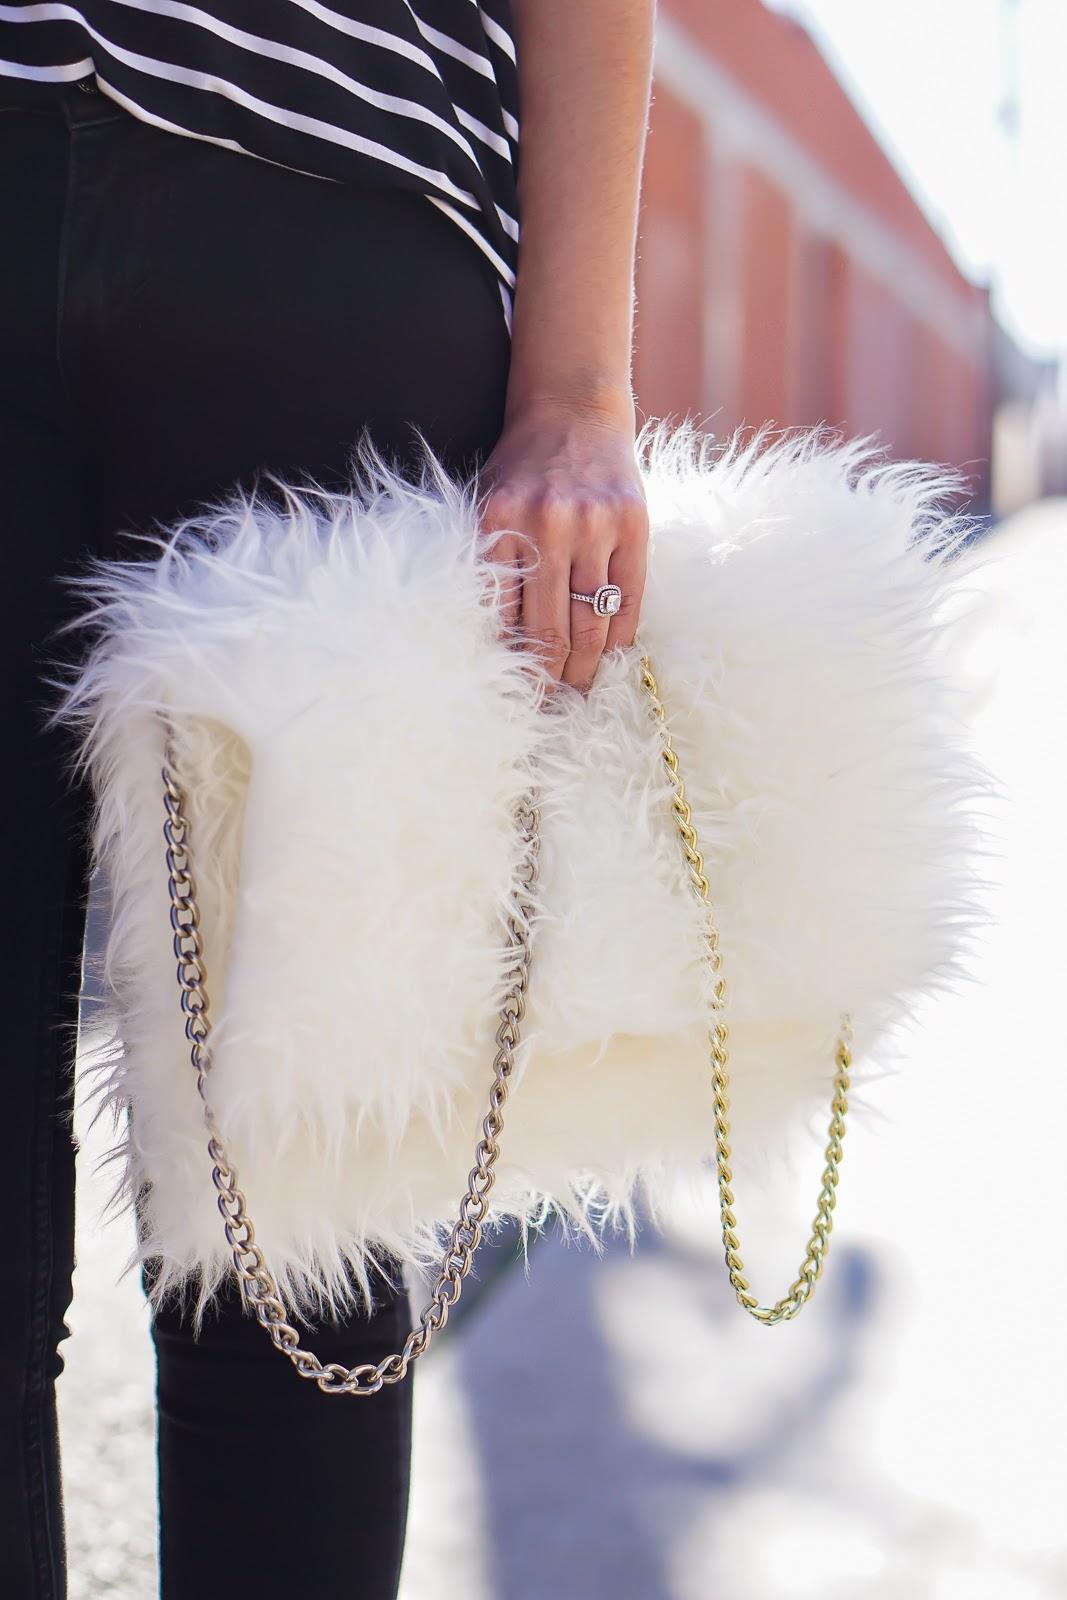 DIY Faux Fur clutch, DIY White Faux Fur bag, Ikea Faux Sheepskin, Zara Black Strappy Heels, Zara High Heel Strappy Sandals, Levis Black Jeggings, Levis Jeans, Striped Shirt, Joe Fresh Striped Top,